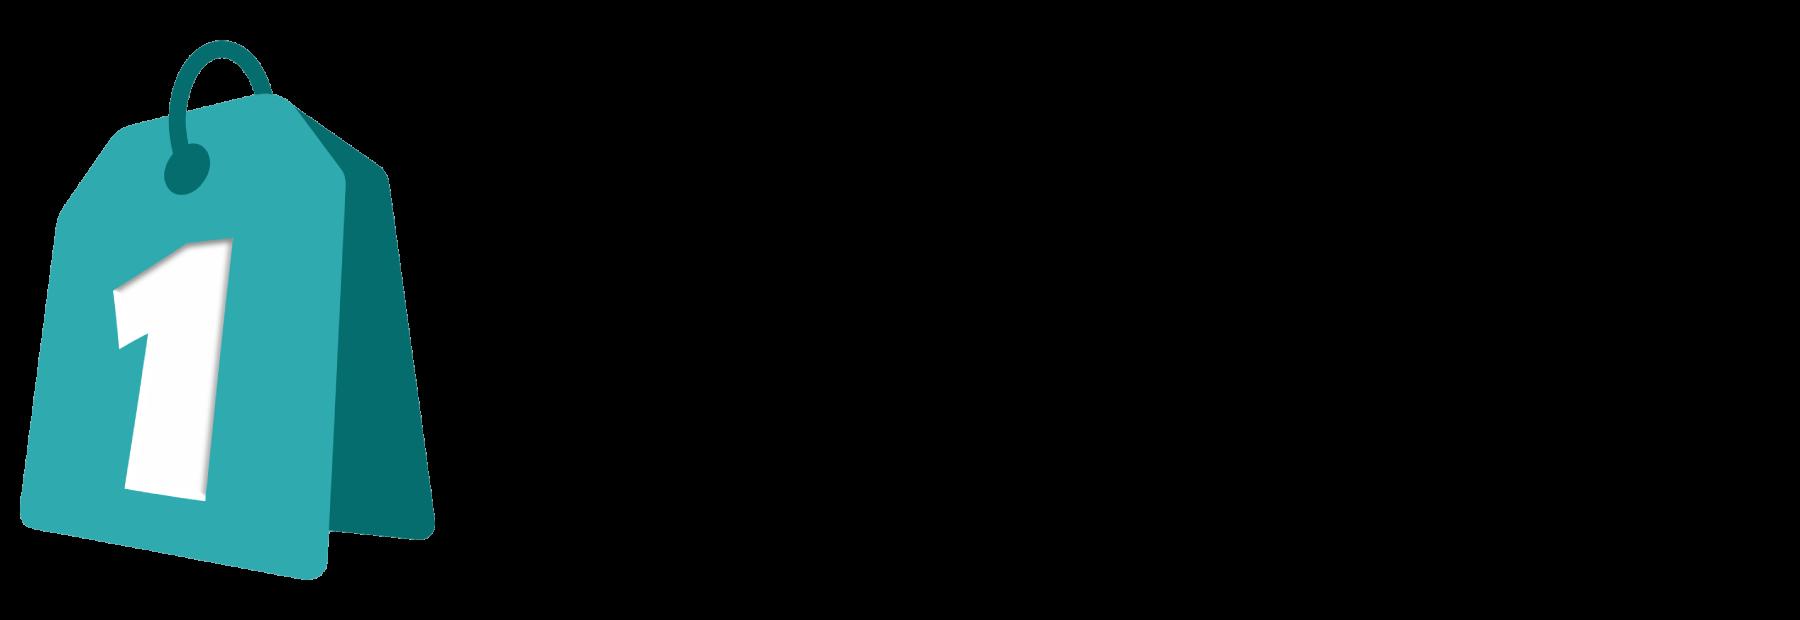 LlevaUno